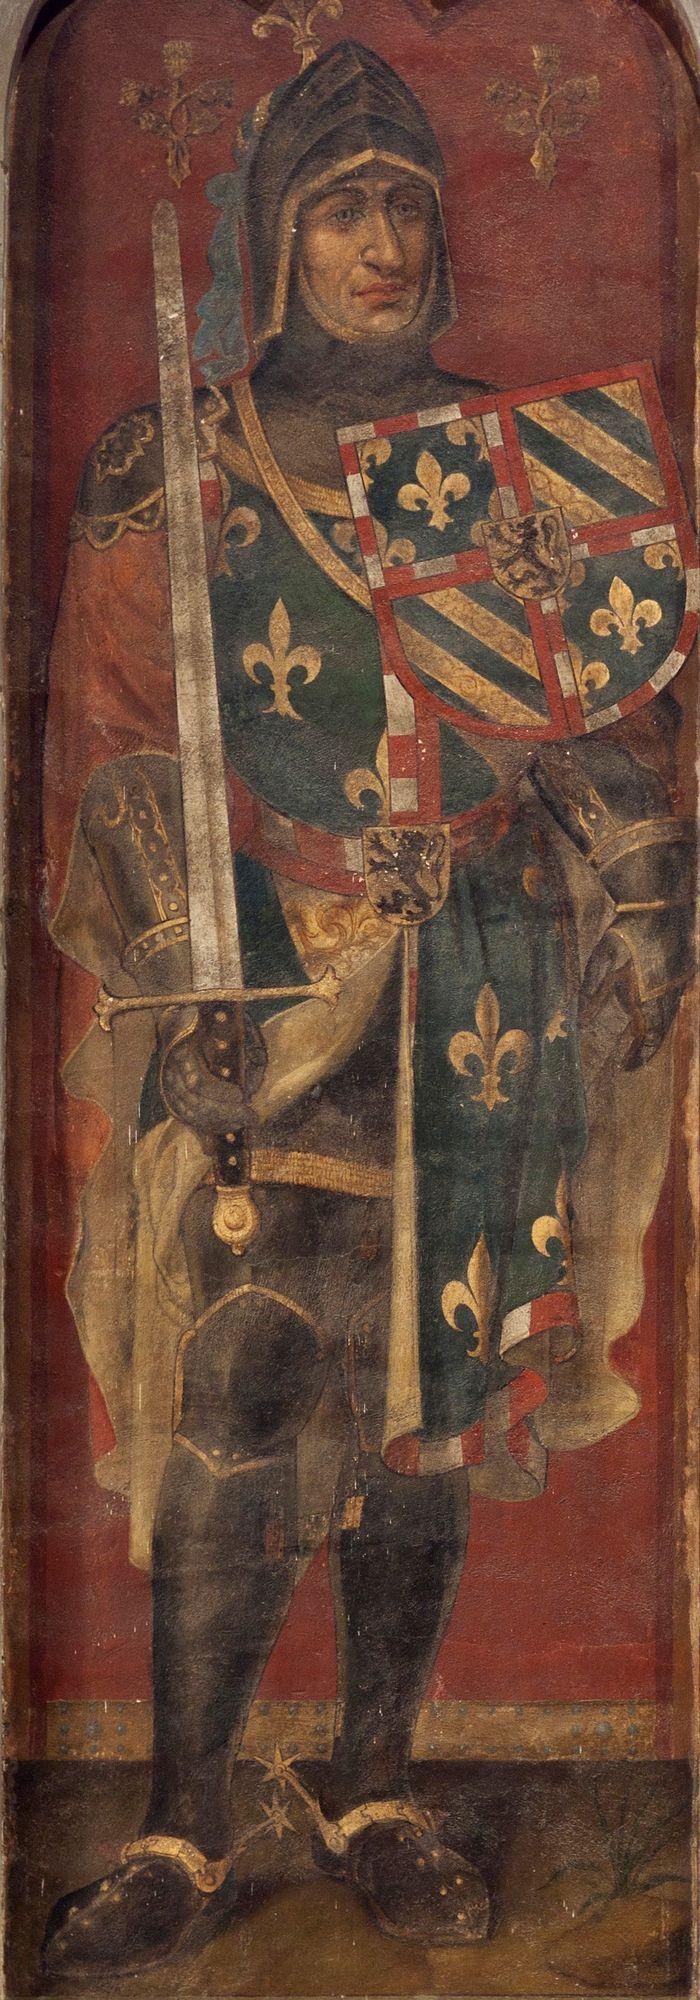 1405 - 1419 Jan zonder Vrees